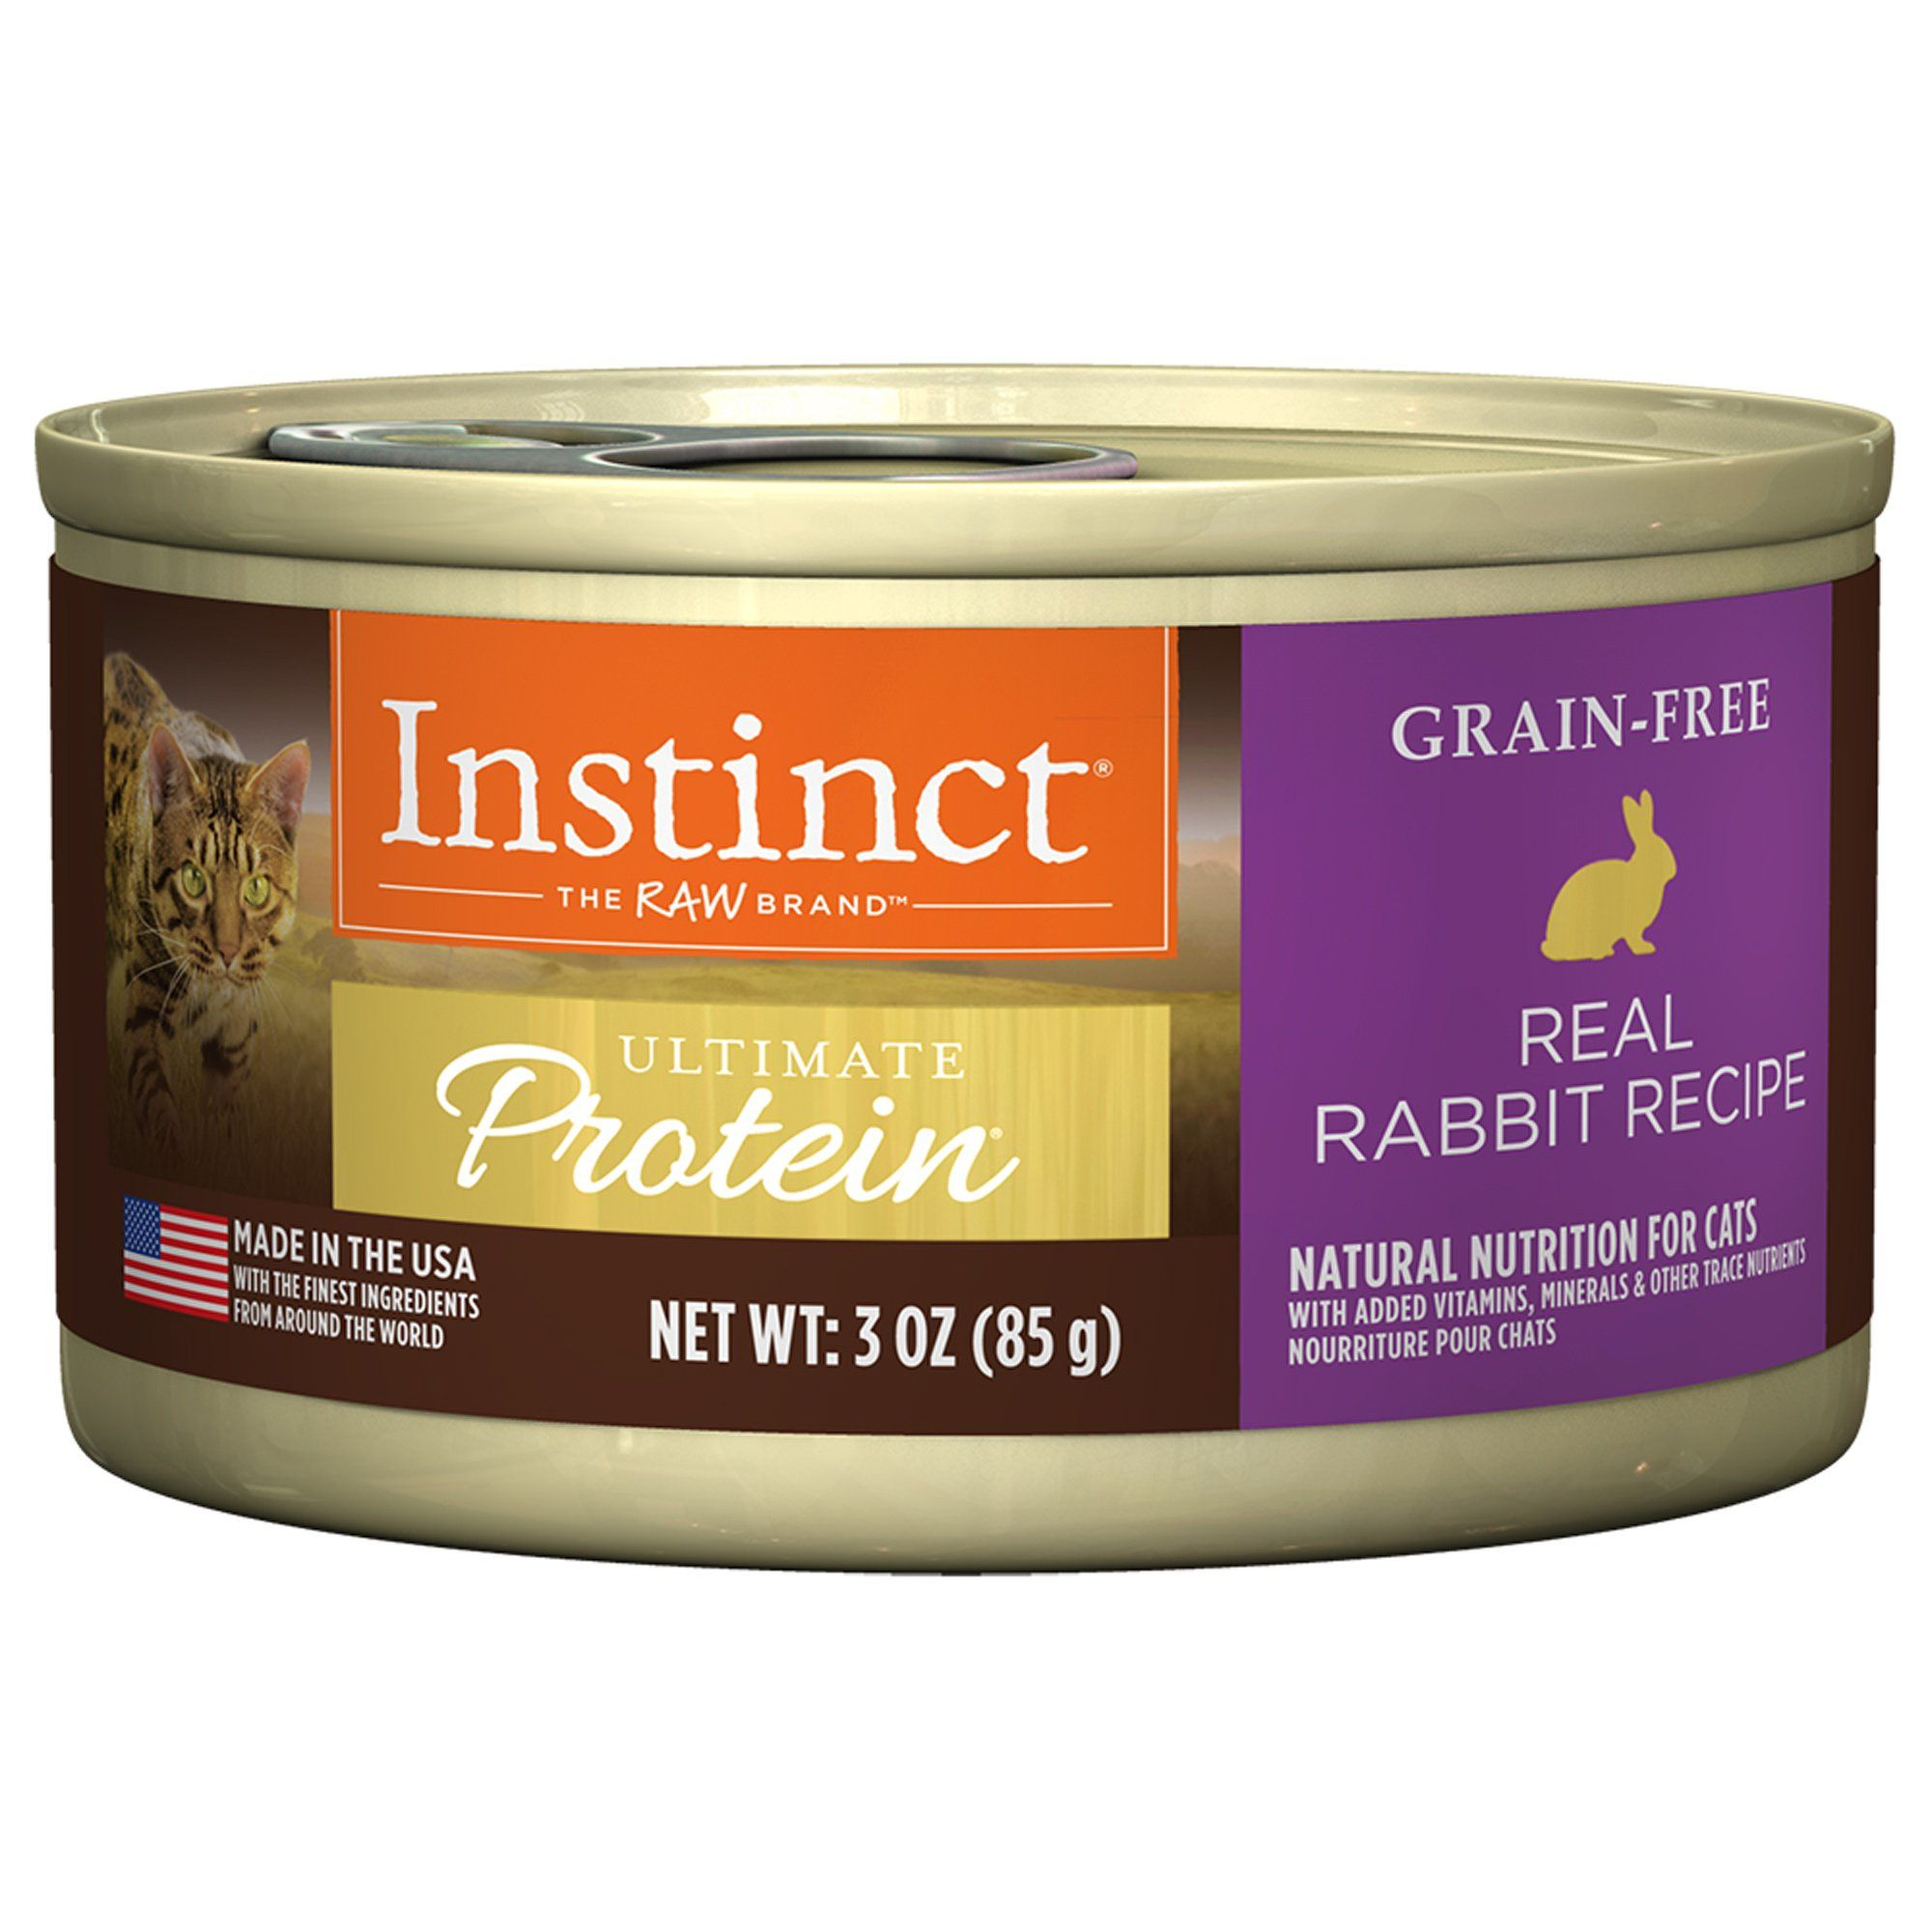 Instinct Ultimate Protein Grain Free Real Rabbit Recipe